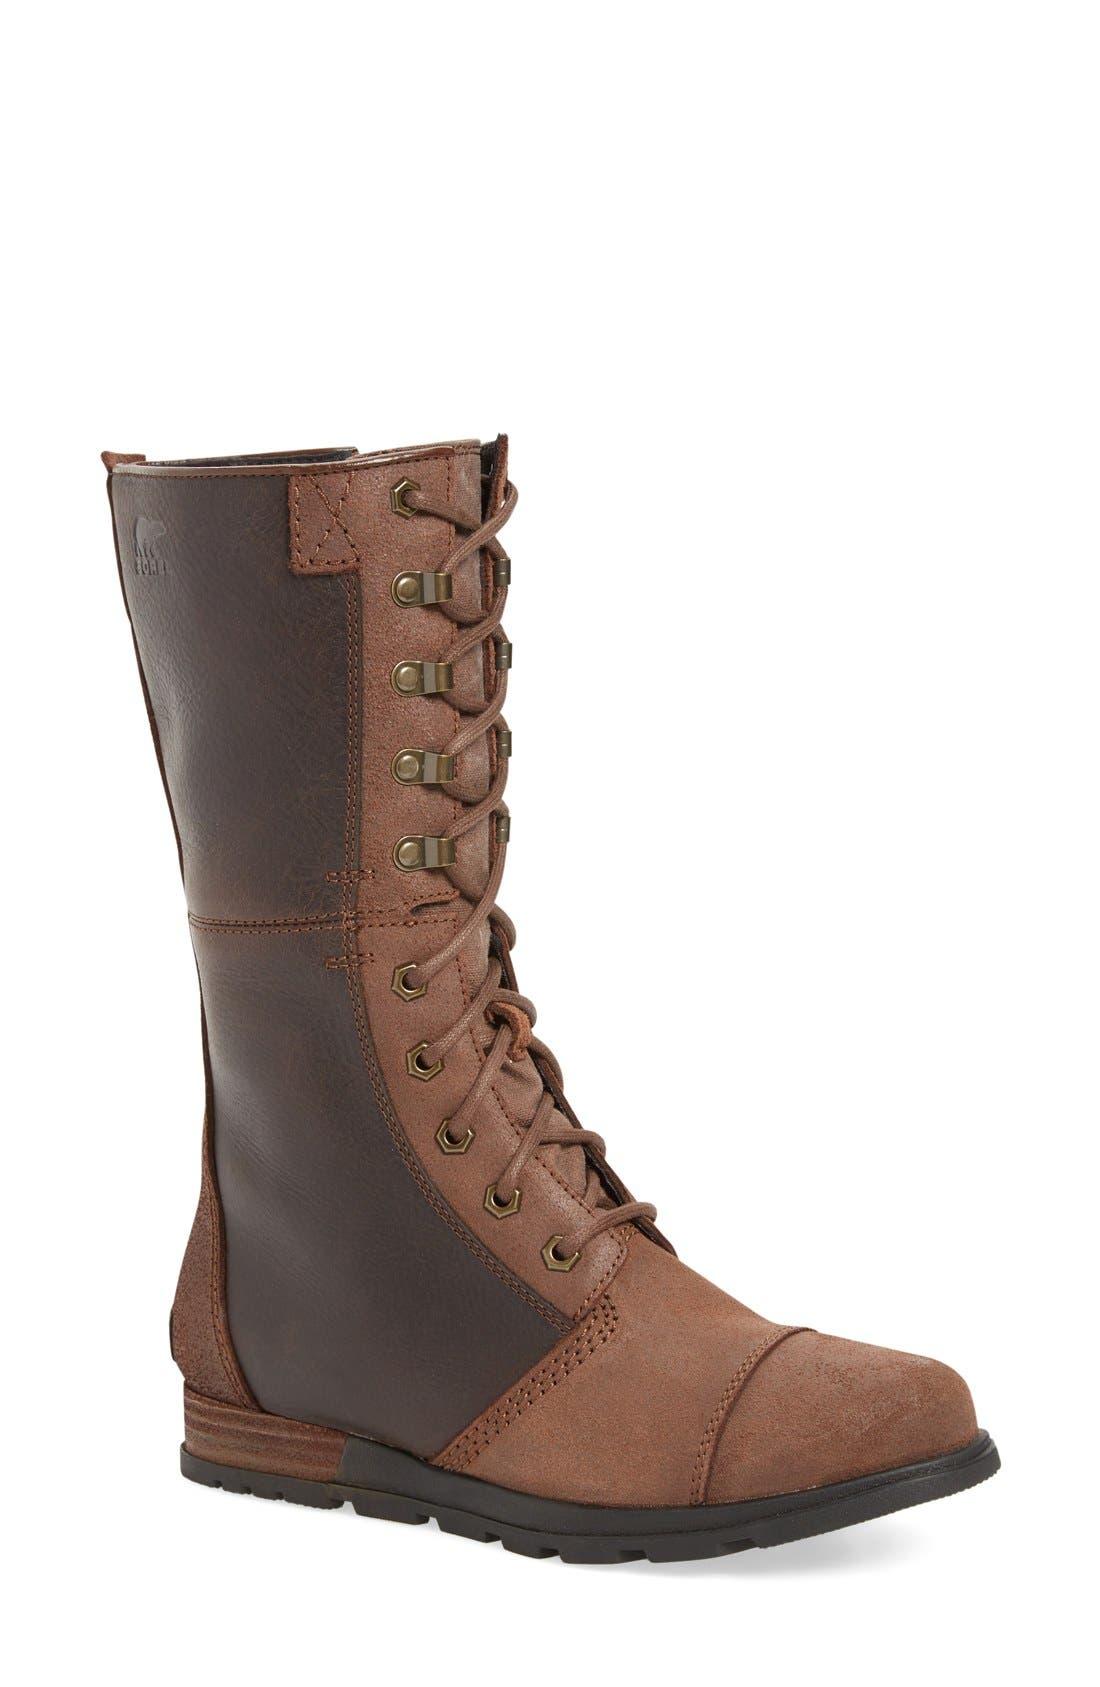 Main Image - SOREL 'Major Maverick' Mid Calf Zip Boot (Women)